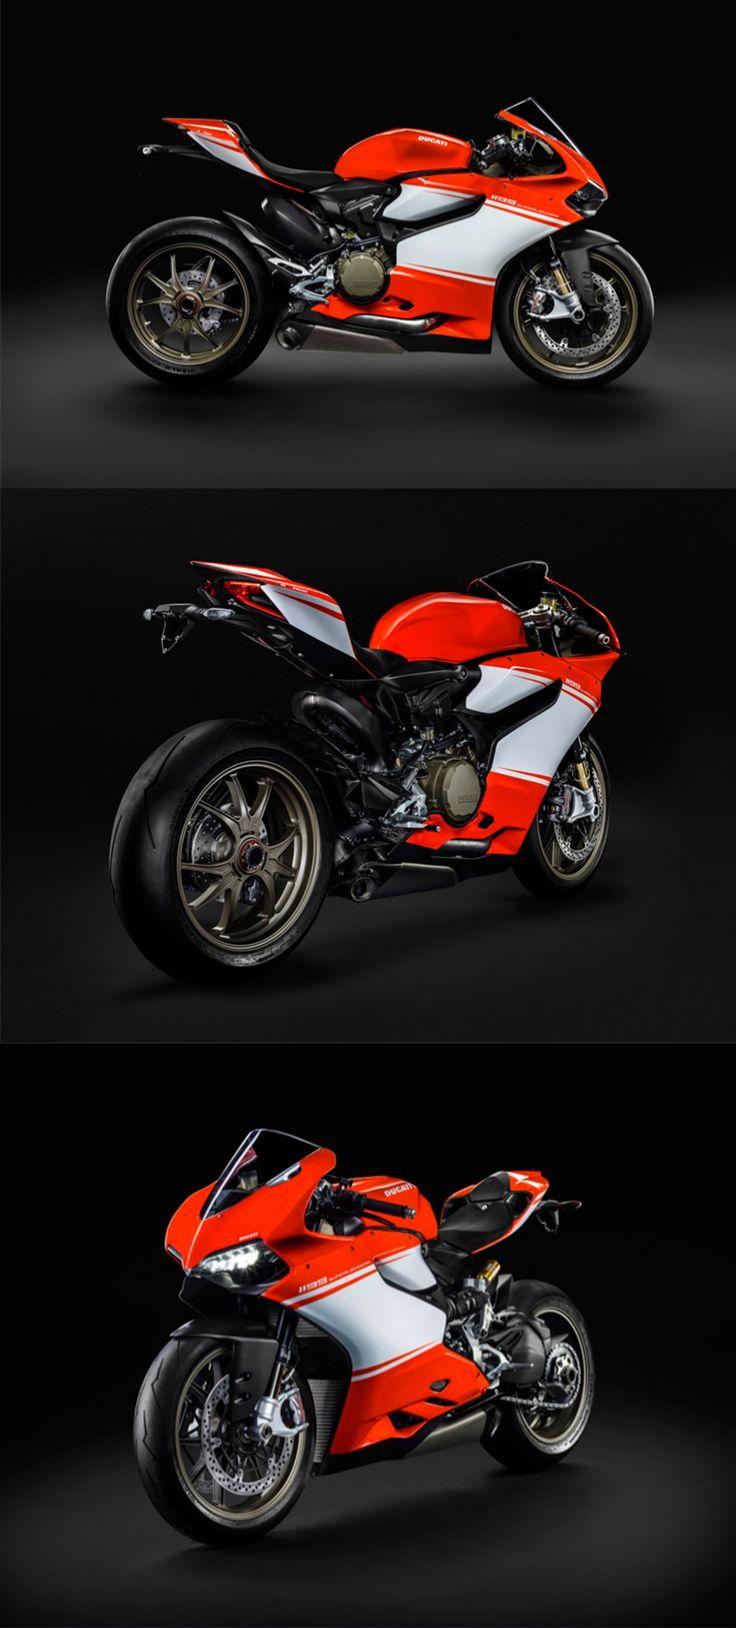 #Ducati Superleggera #superbike